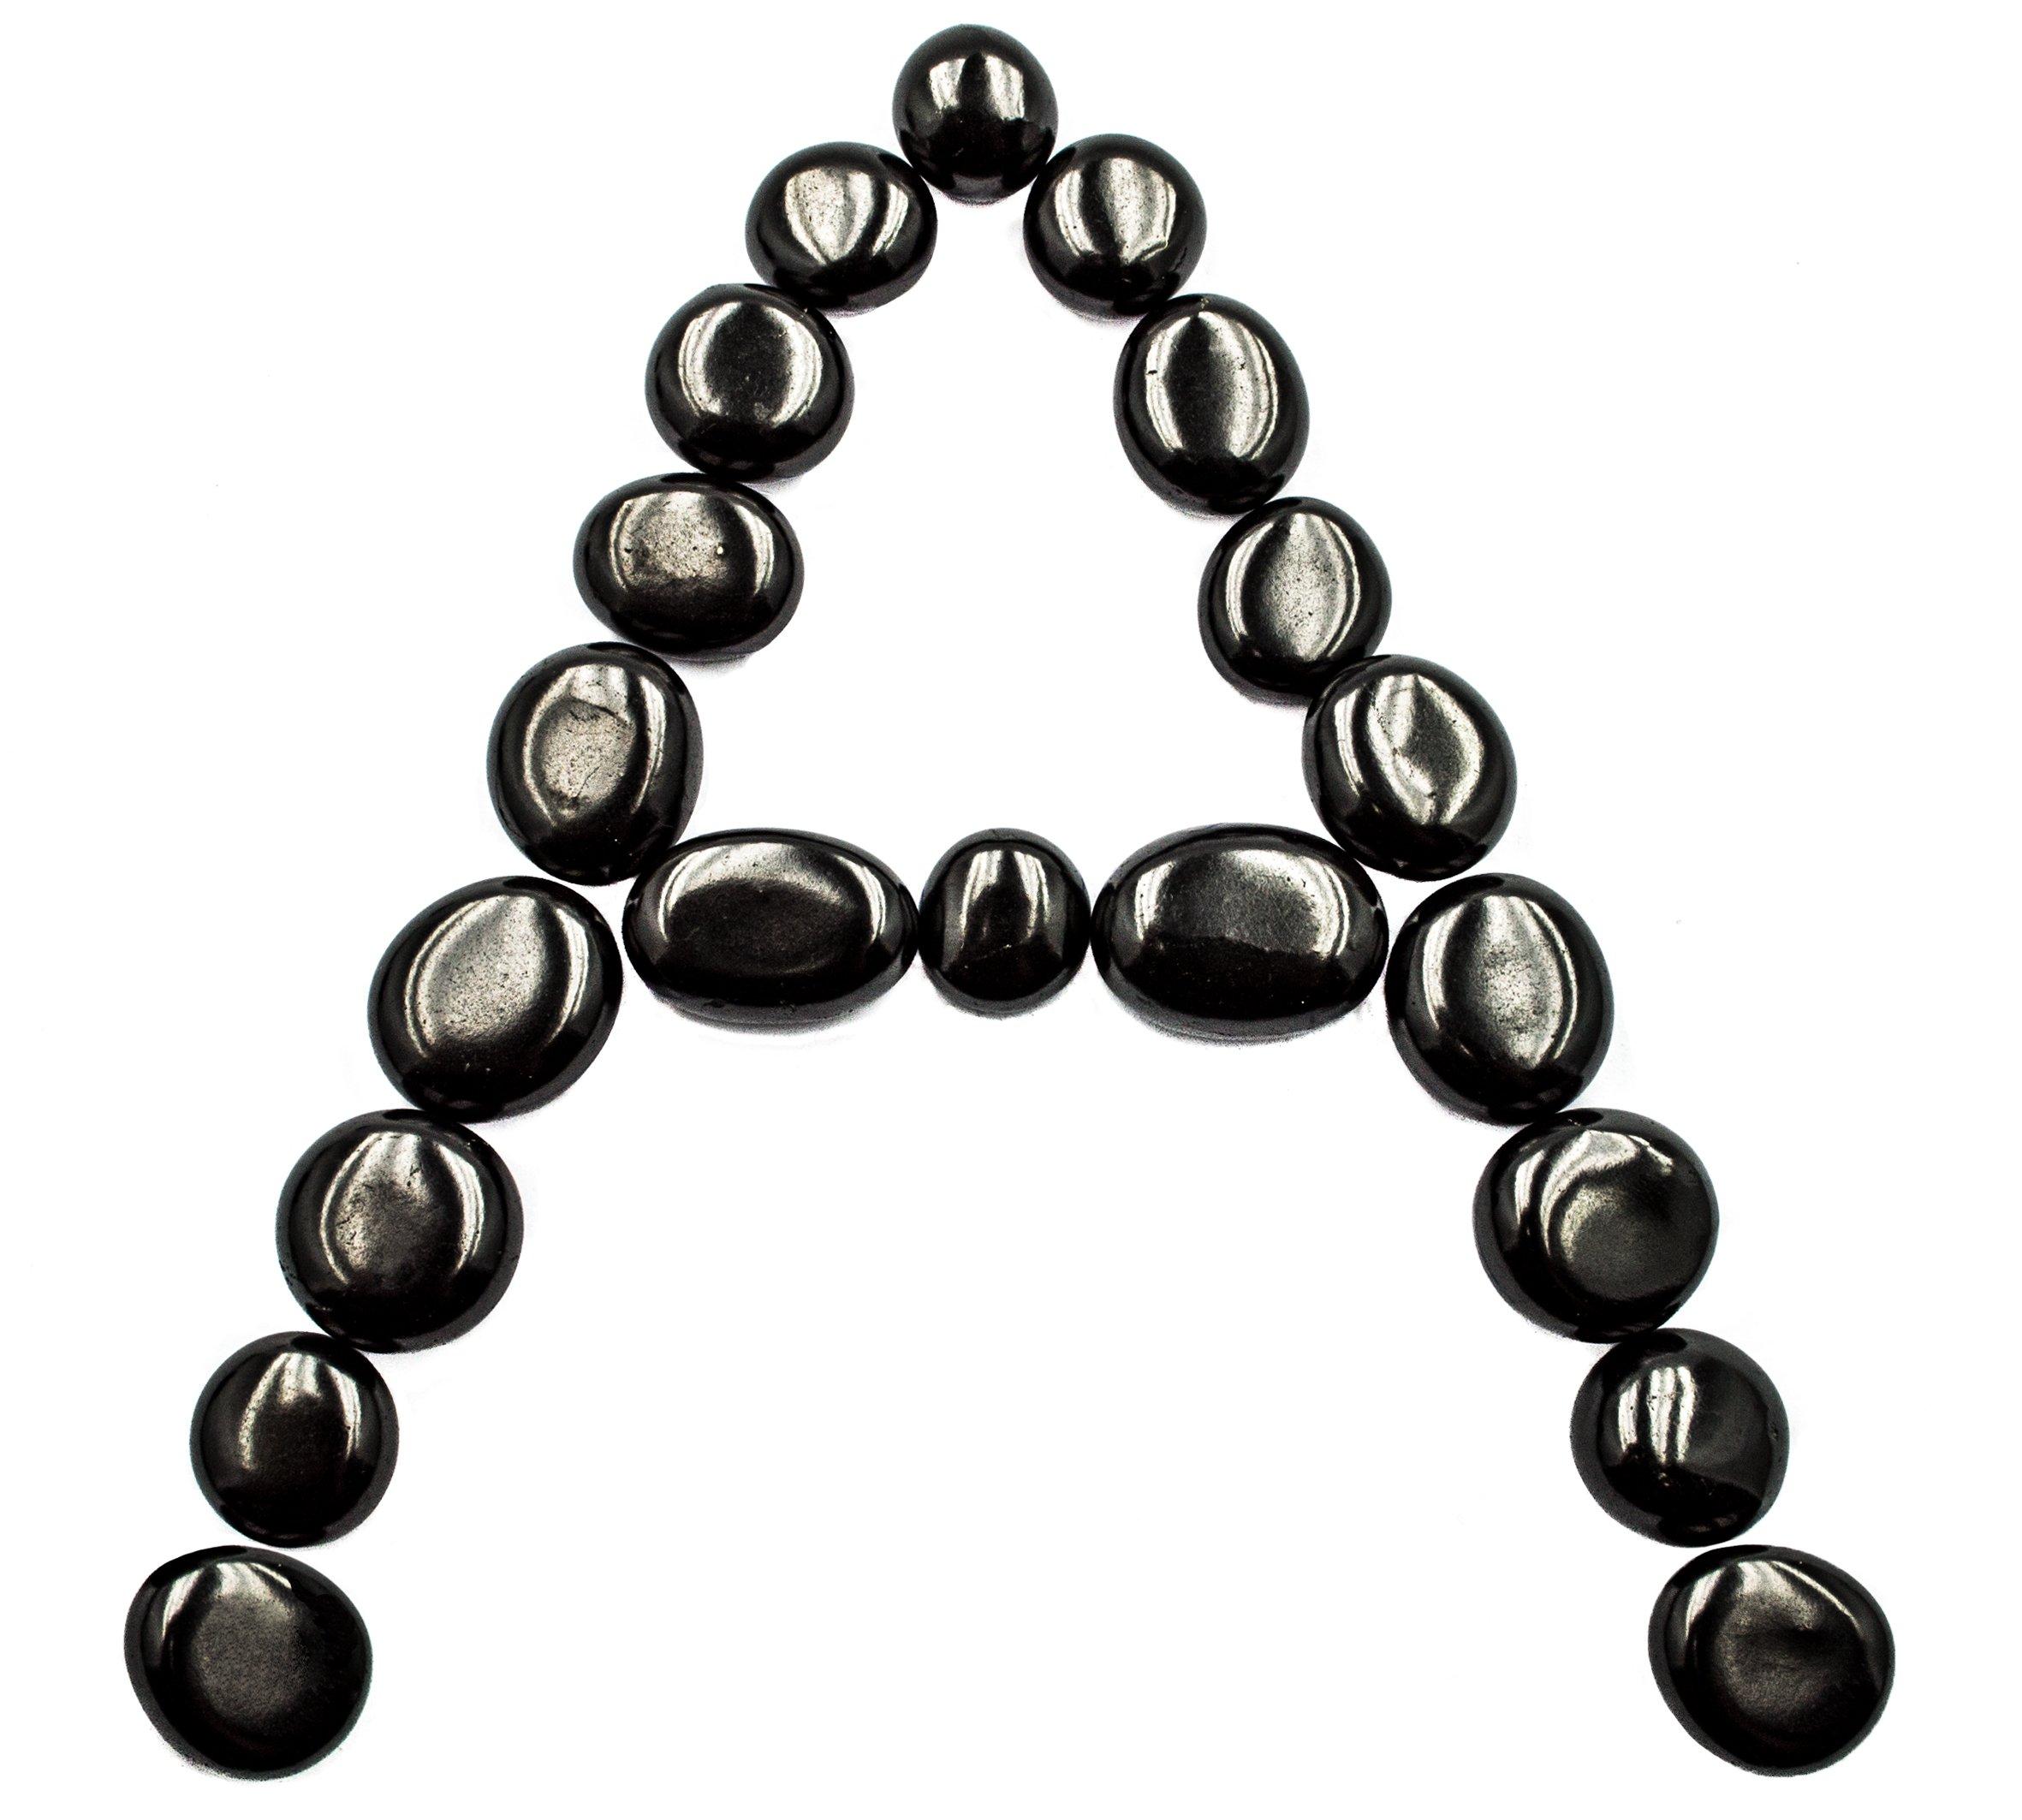 Wallystone Gems 20 pcs Total 100-110 Gram AAA Grade Premium Tumbled Shungite Stones - Ideal Rounded Oval Shape